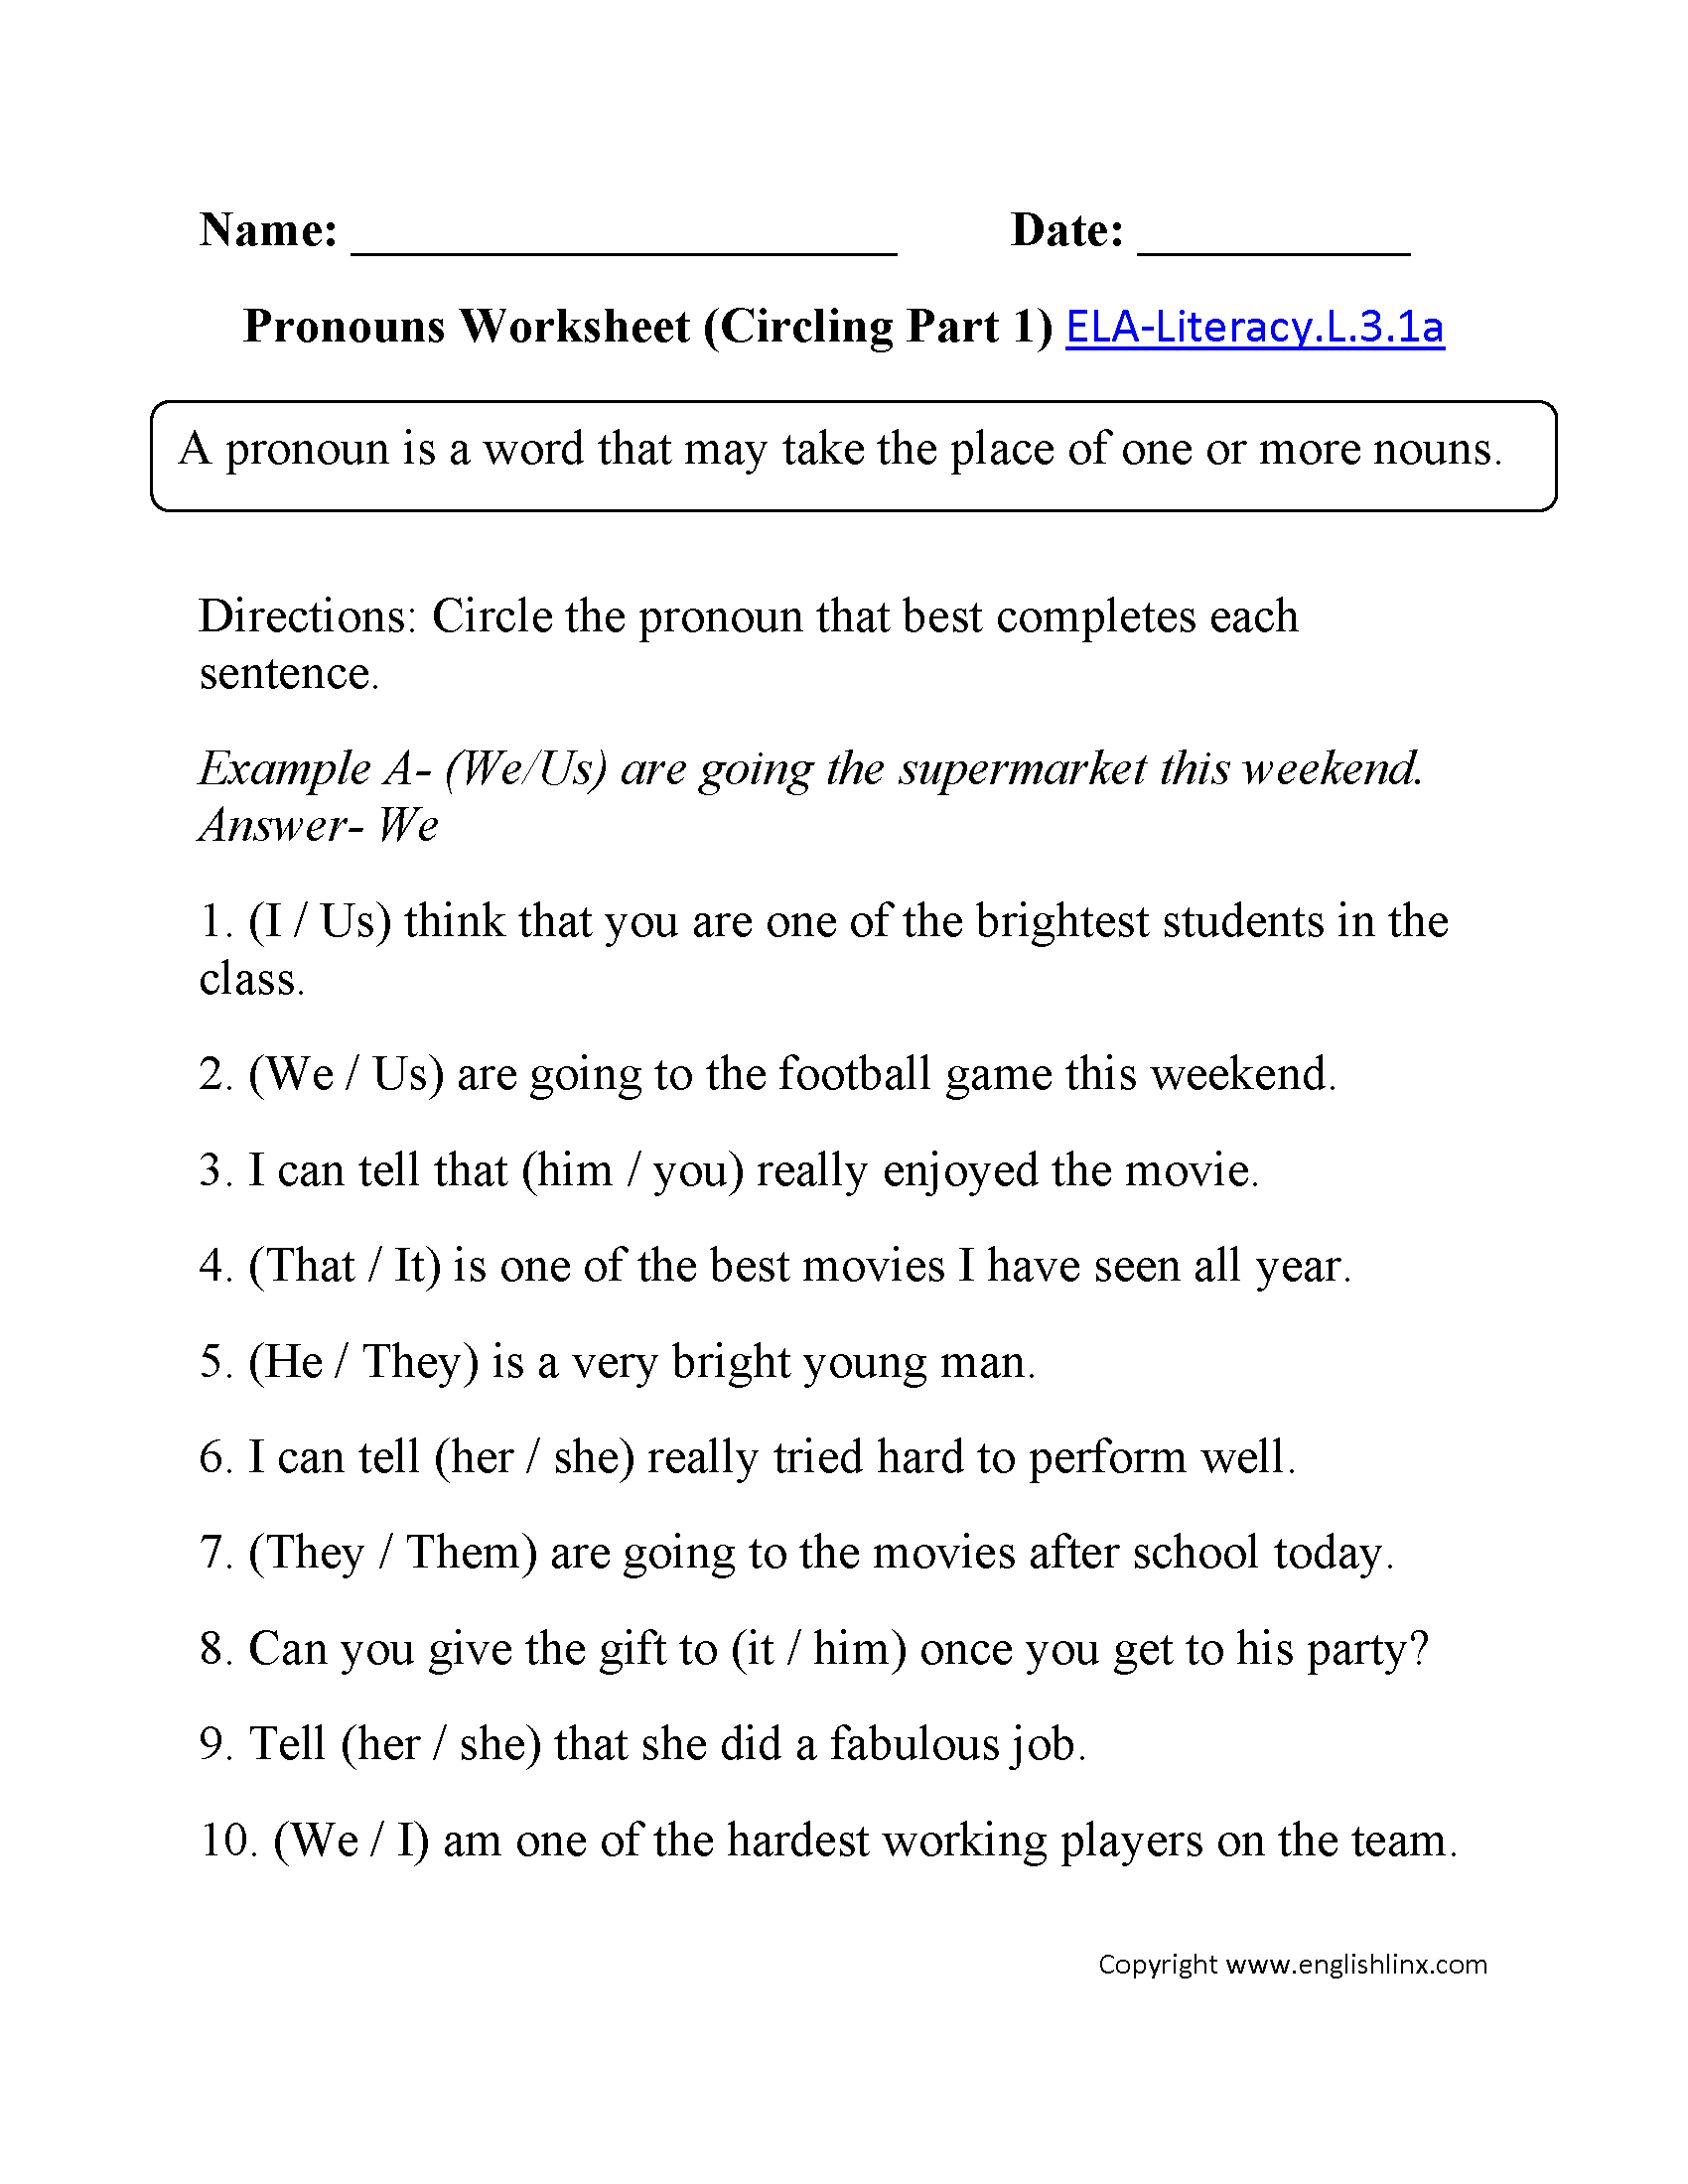 Pronouns Worksheet 2 ELA-Literacy.L.3.1a Language Worksheet ...